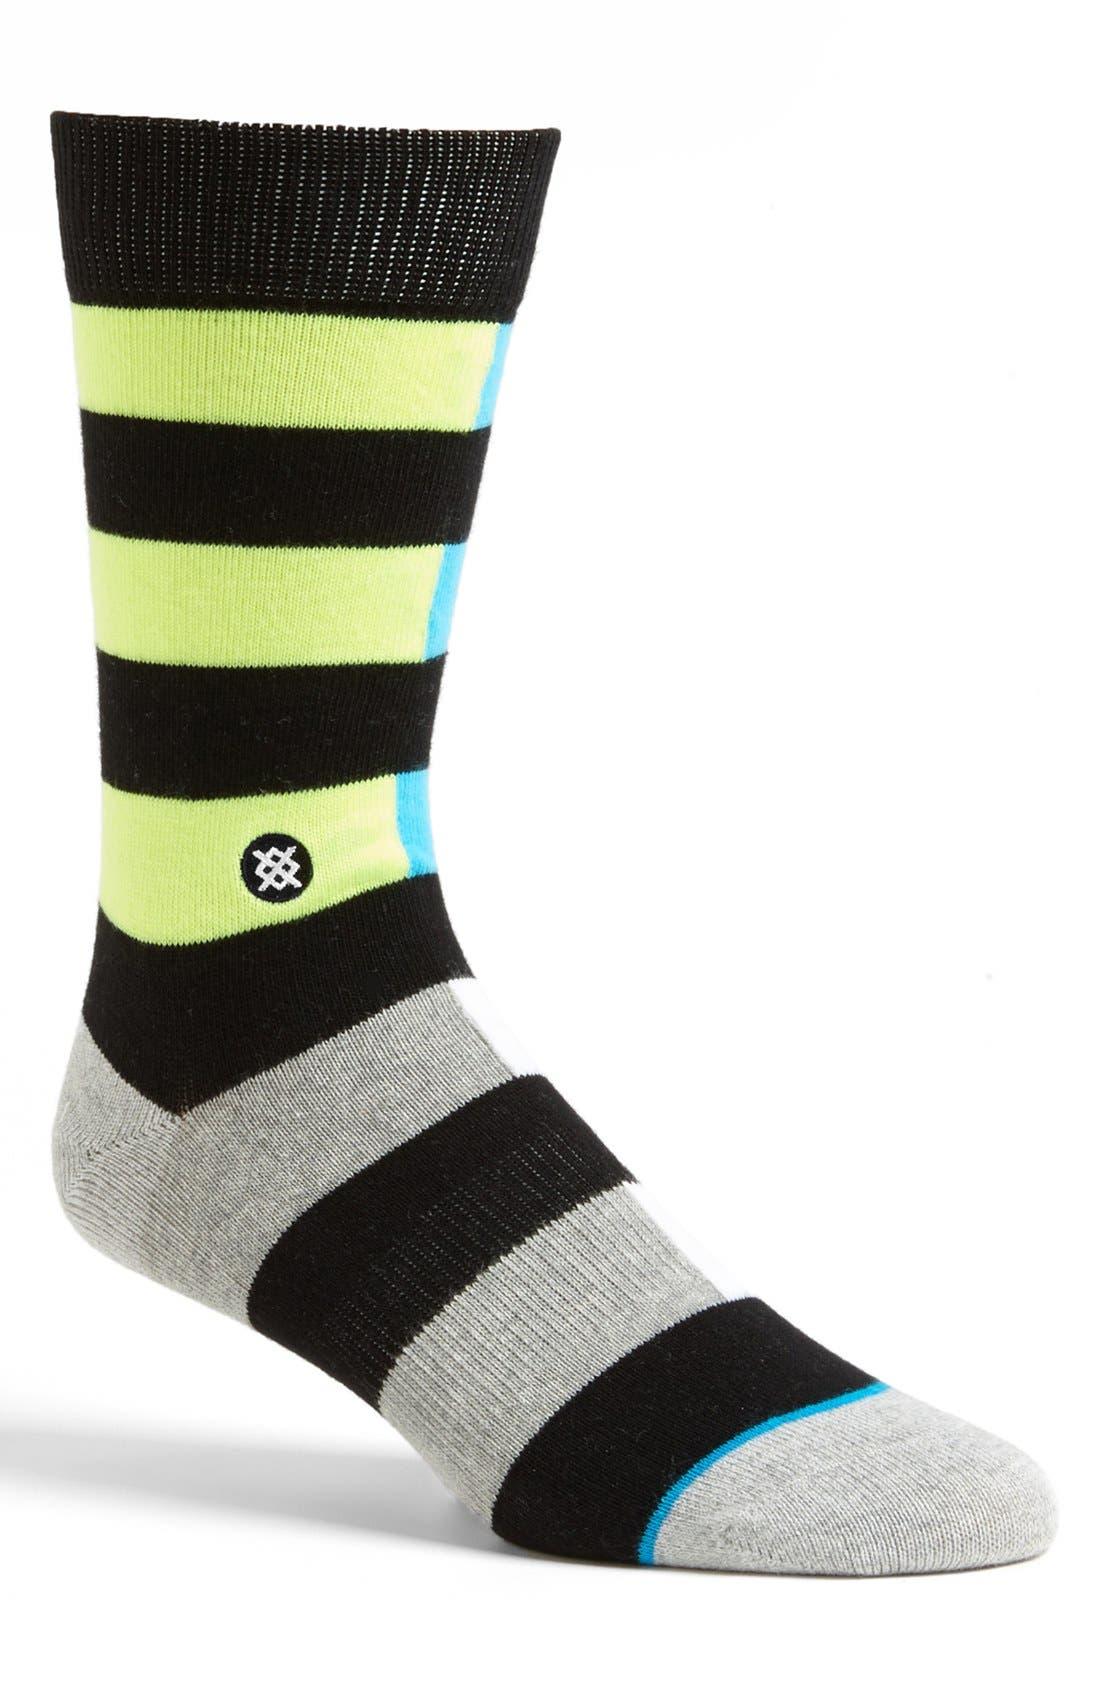 Main Image - Stance 'Mason' Socks